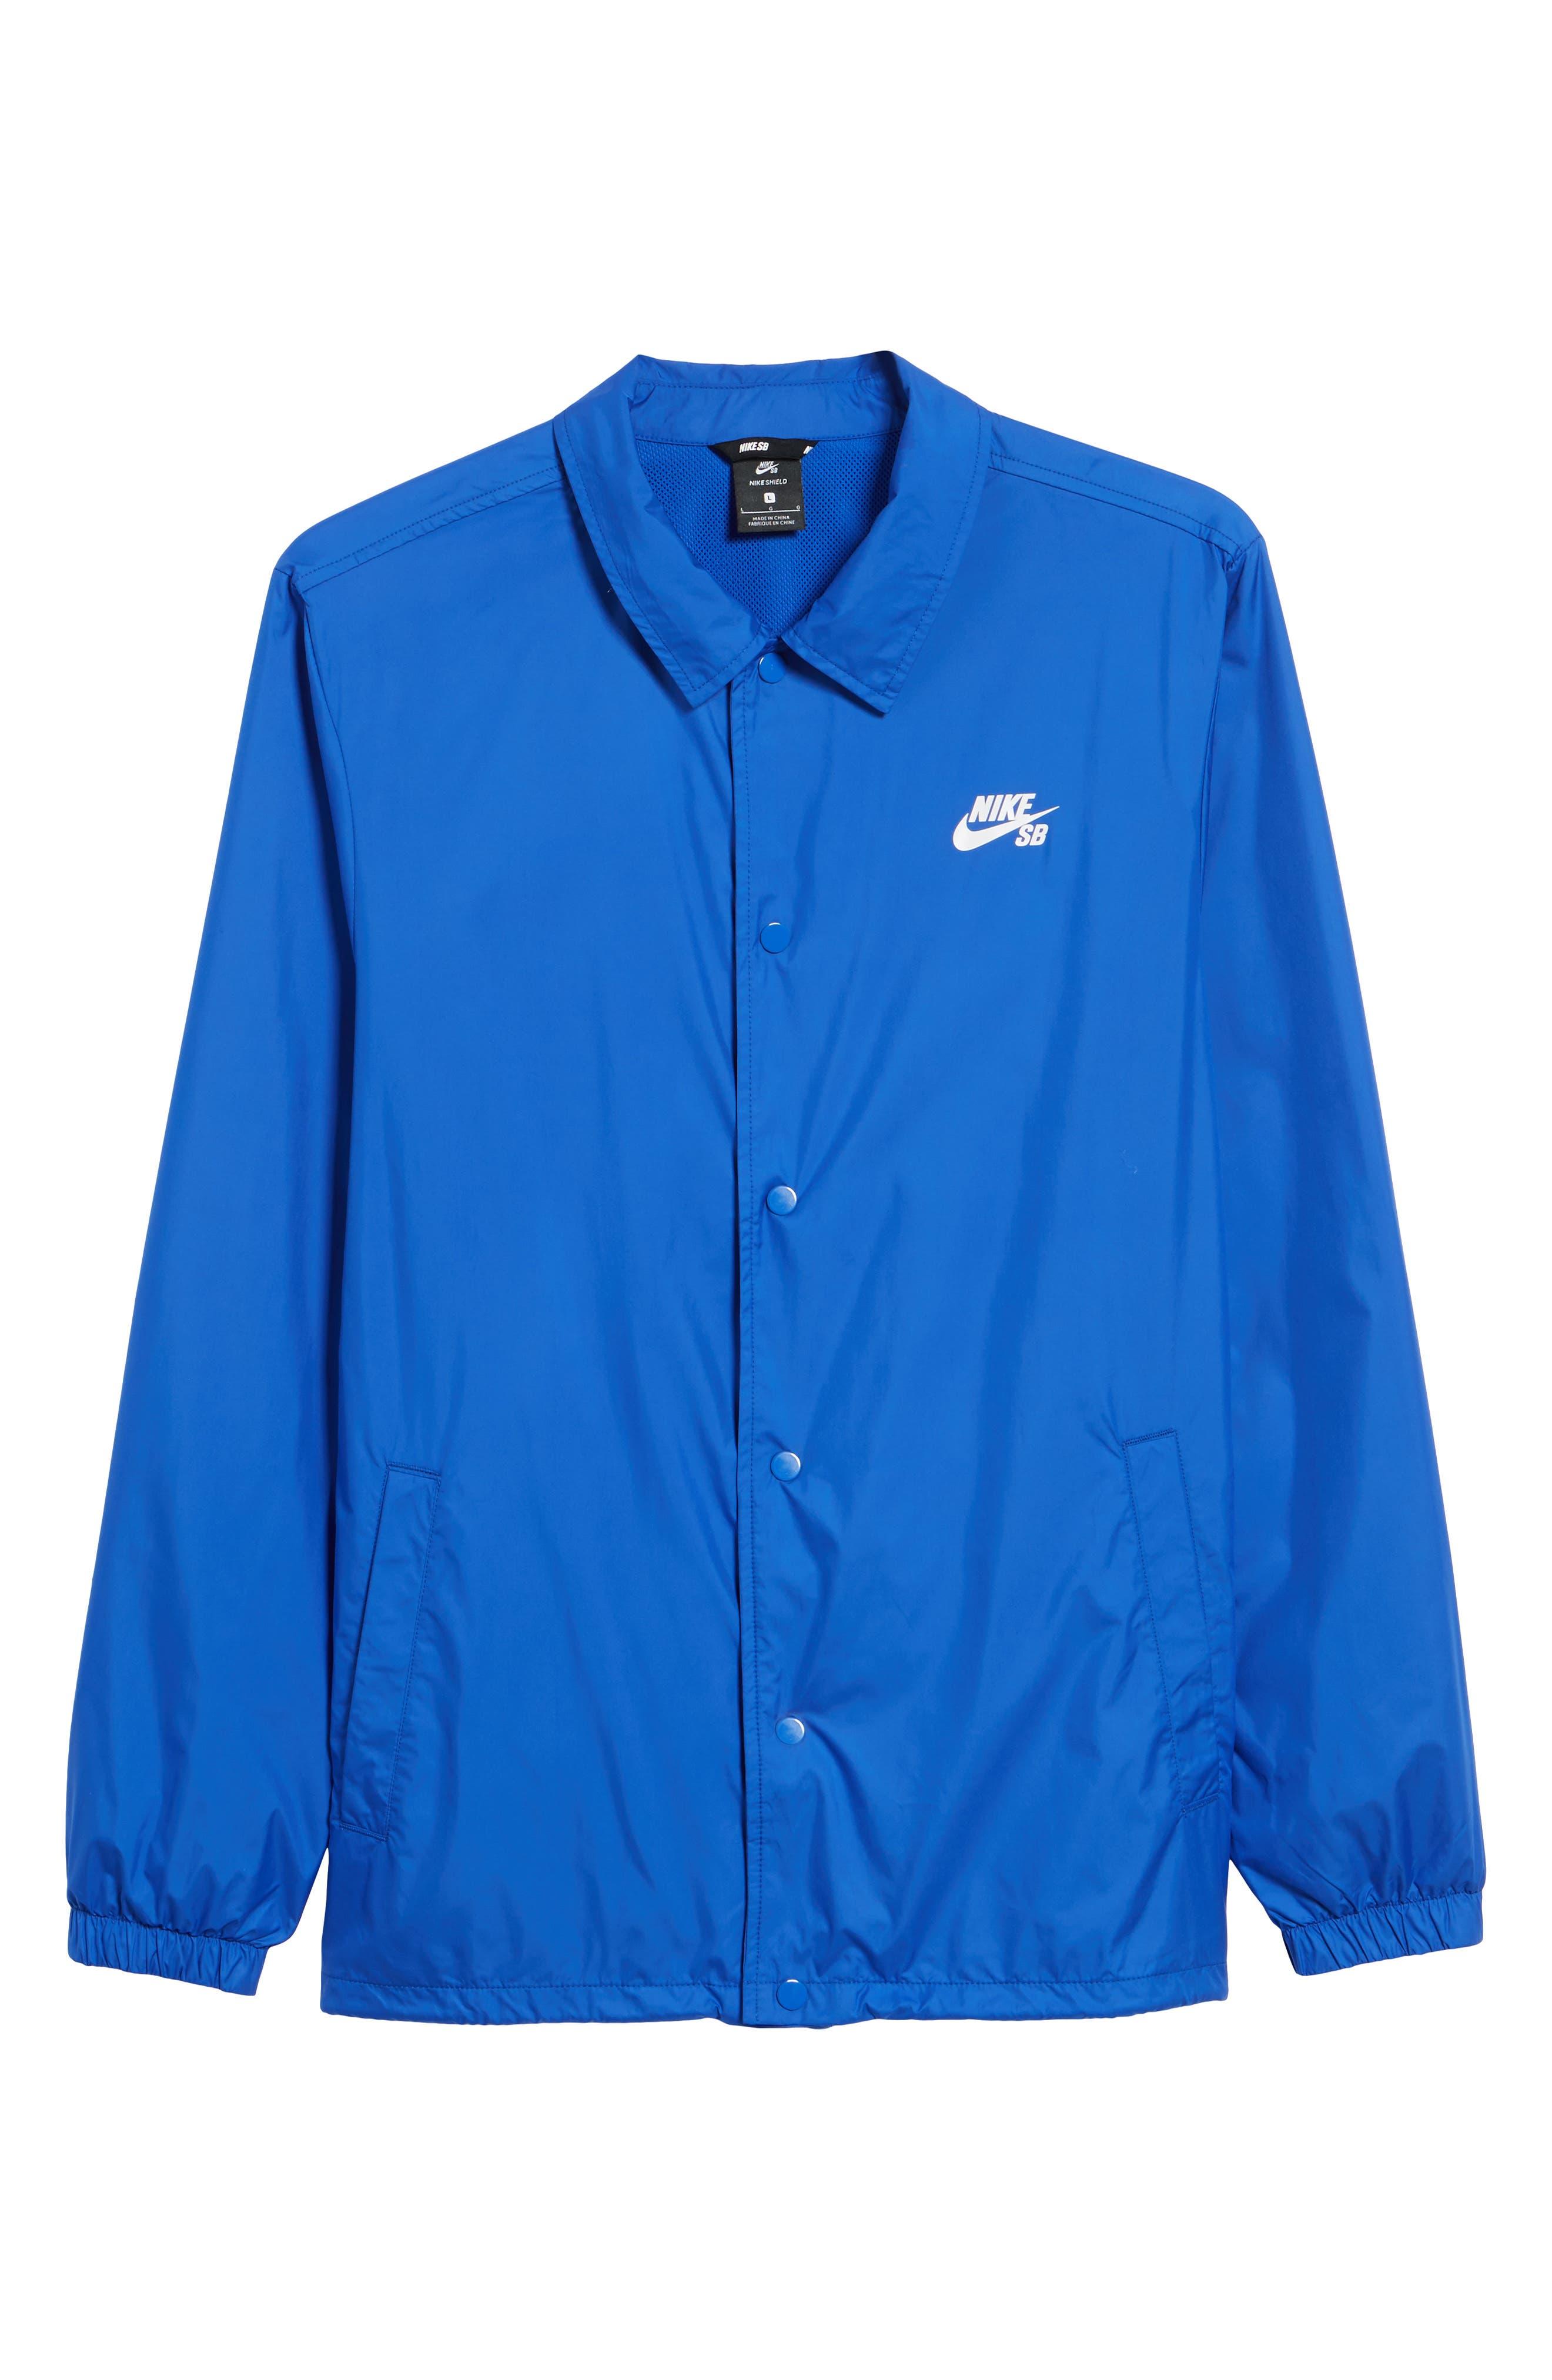 SB Shield Coach's Jacket,                             Alternate thumbnail 6, color,                             HYPER ROYAL/ WHITE